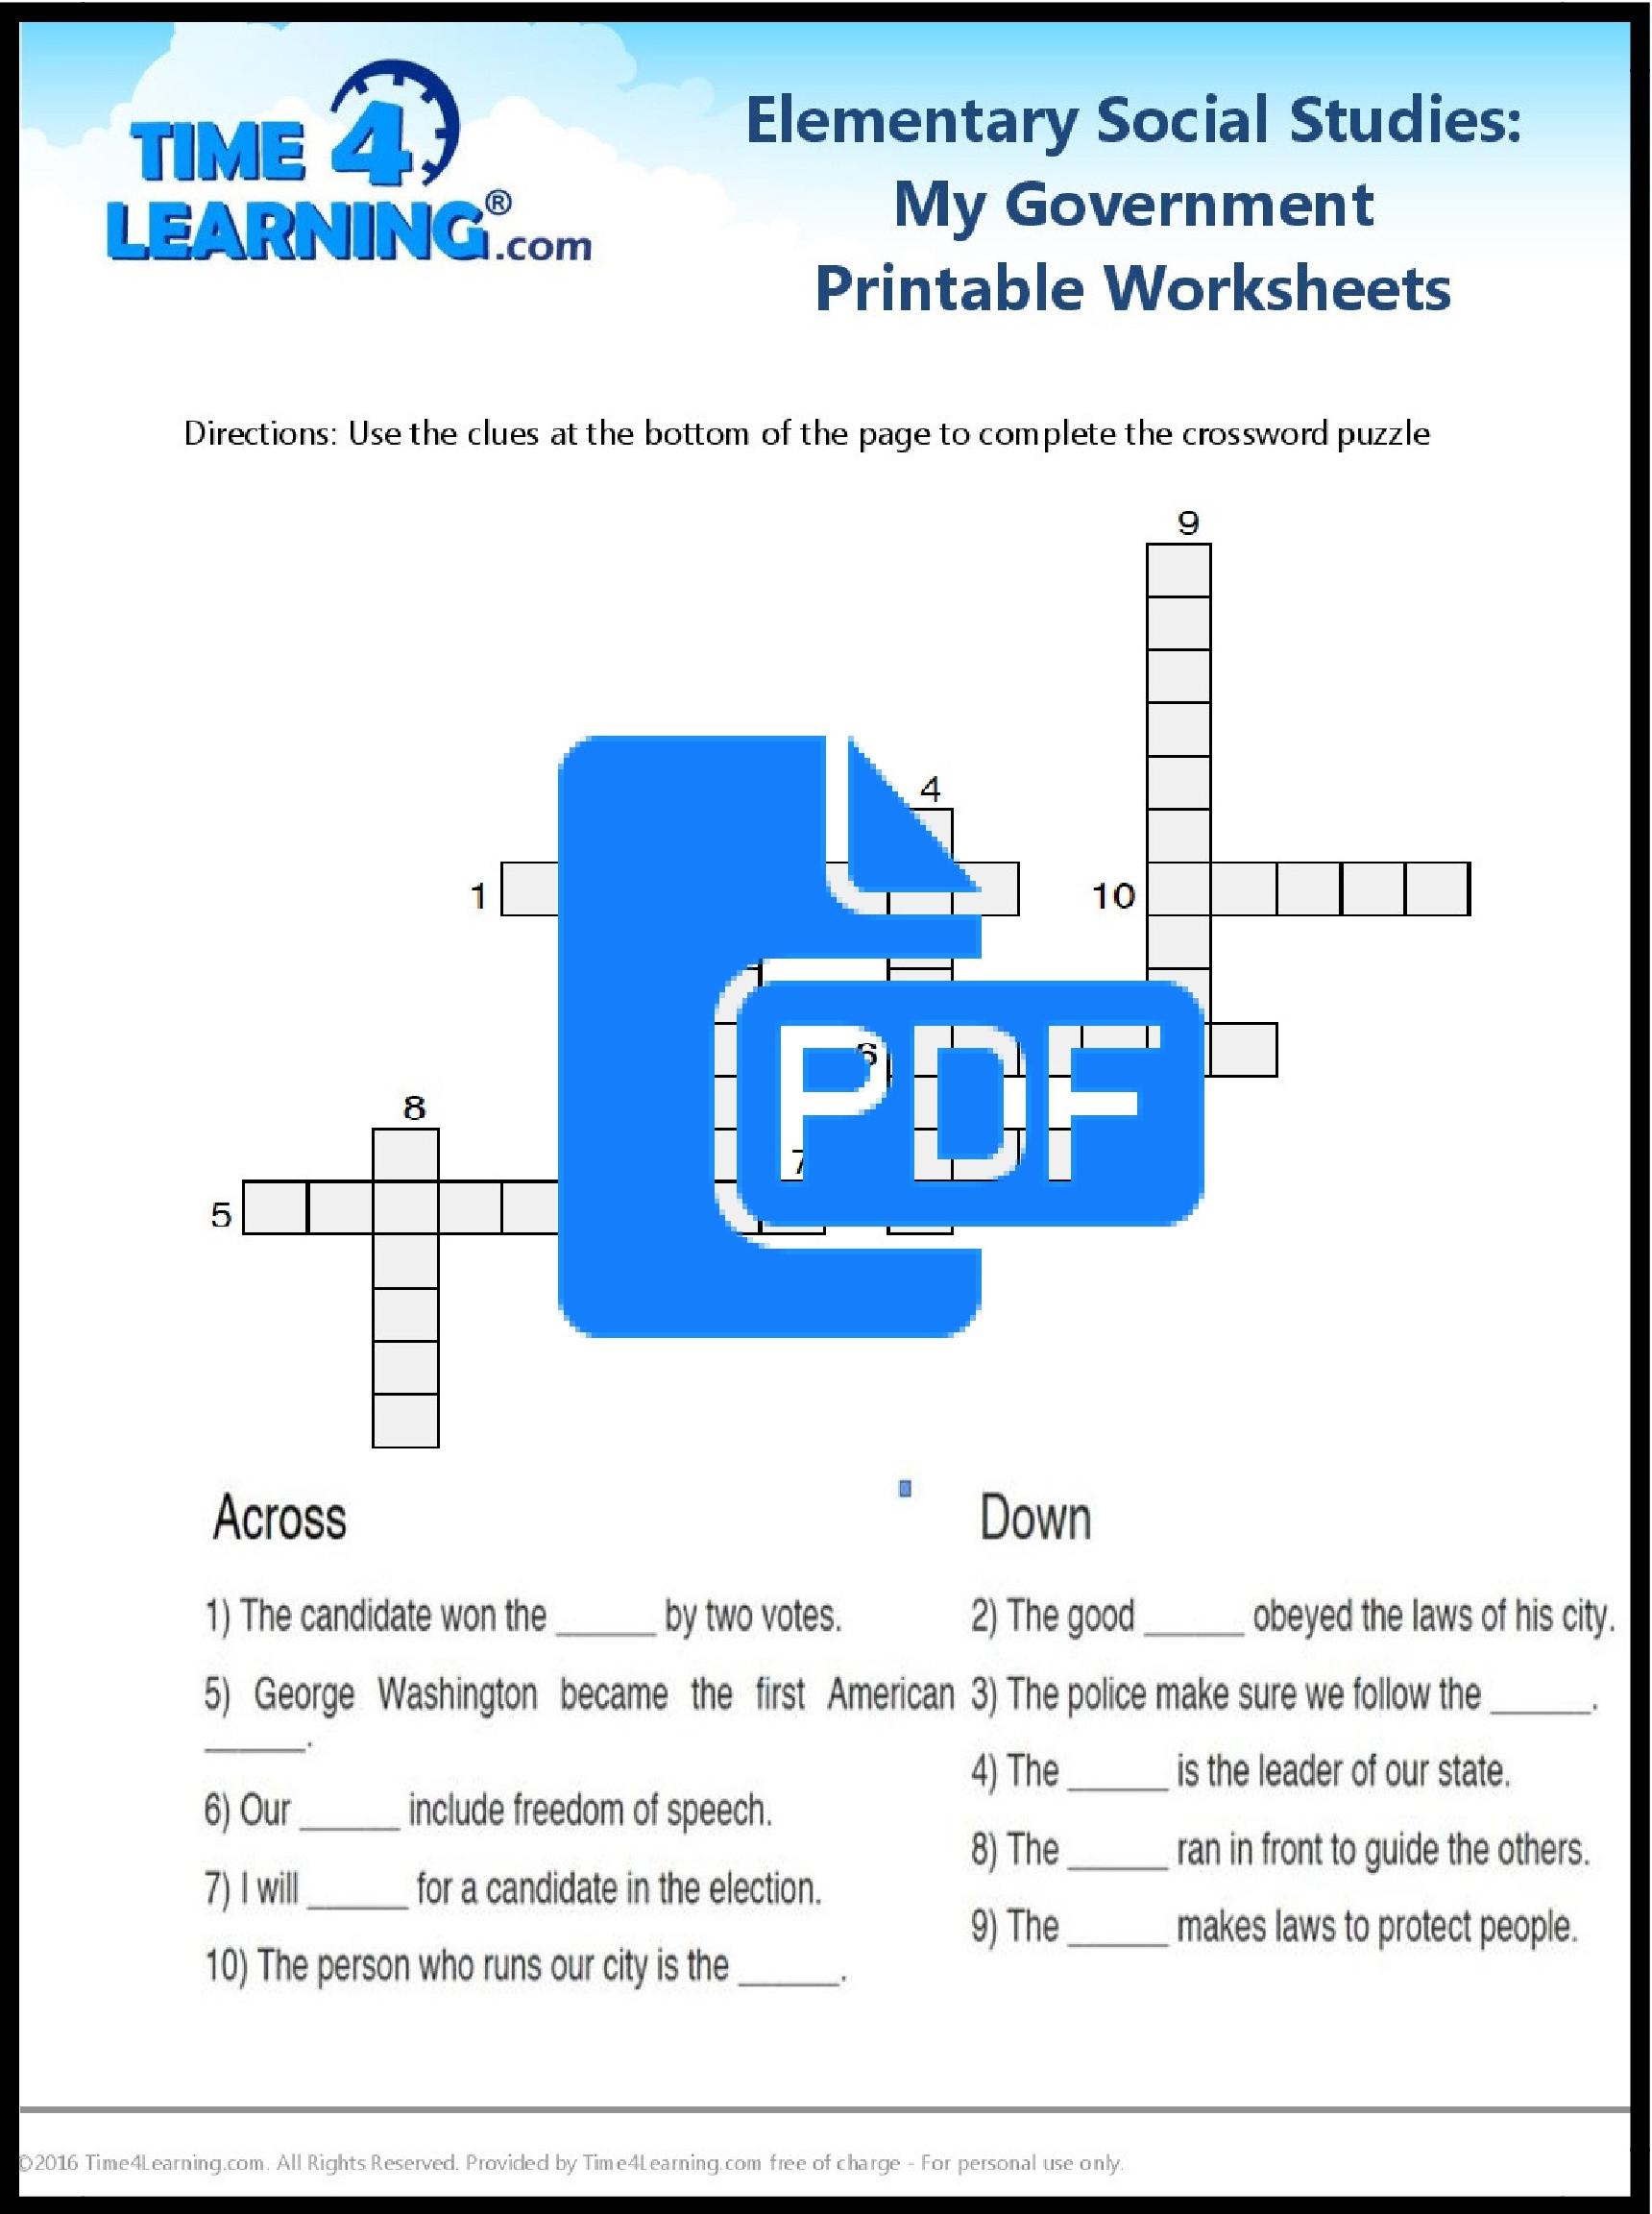 5th Grade Geography Worksheets Free Printable Elementary social Stu S Worksheet